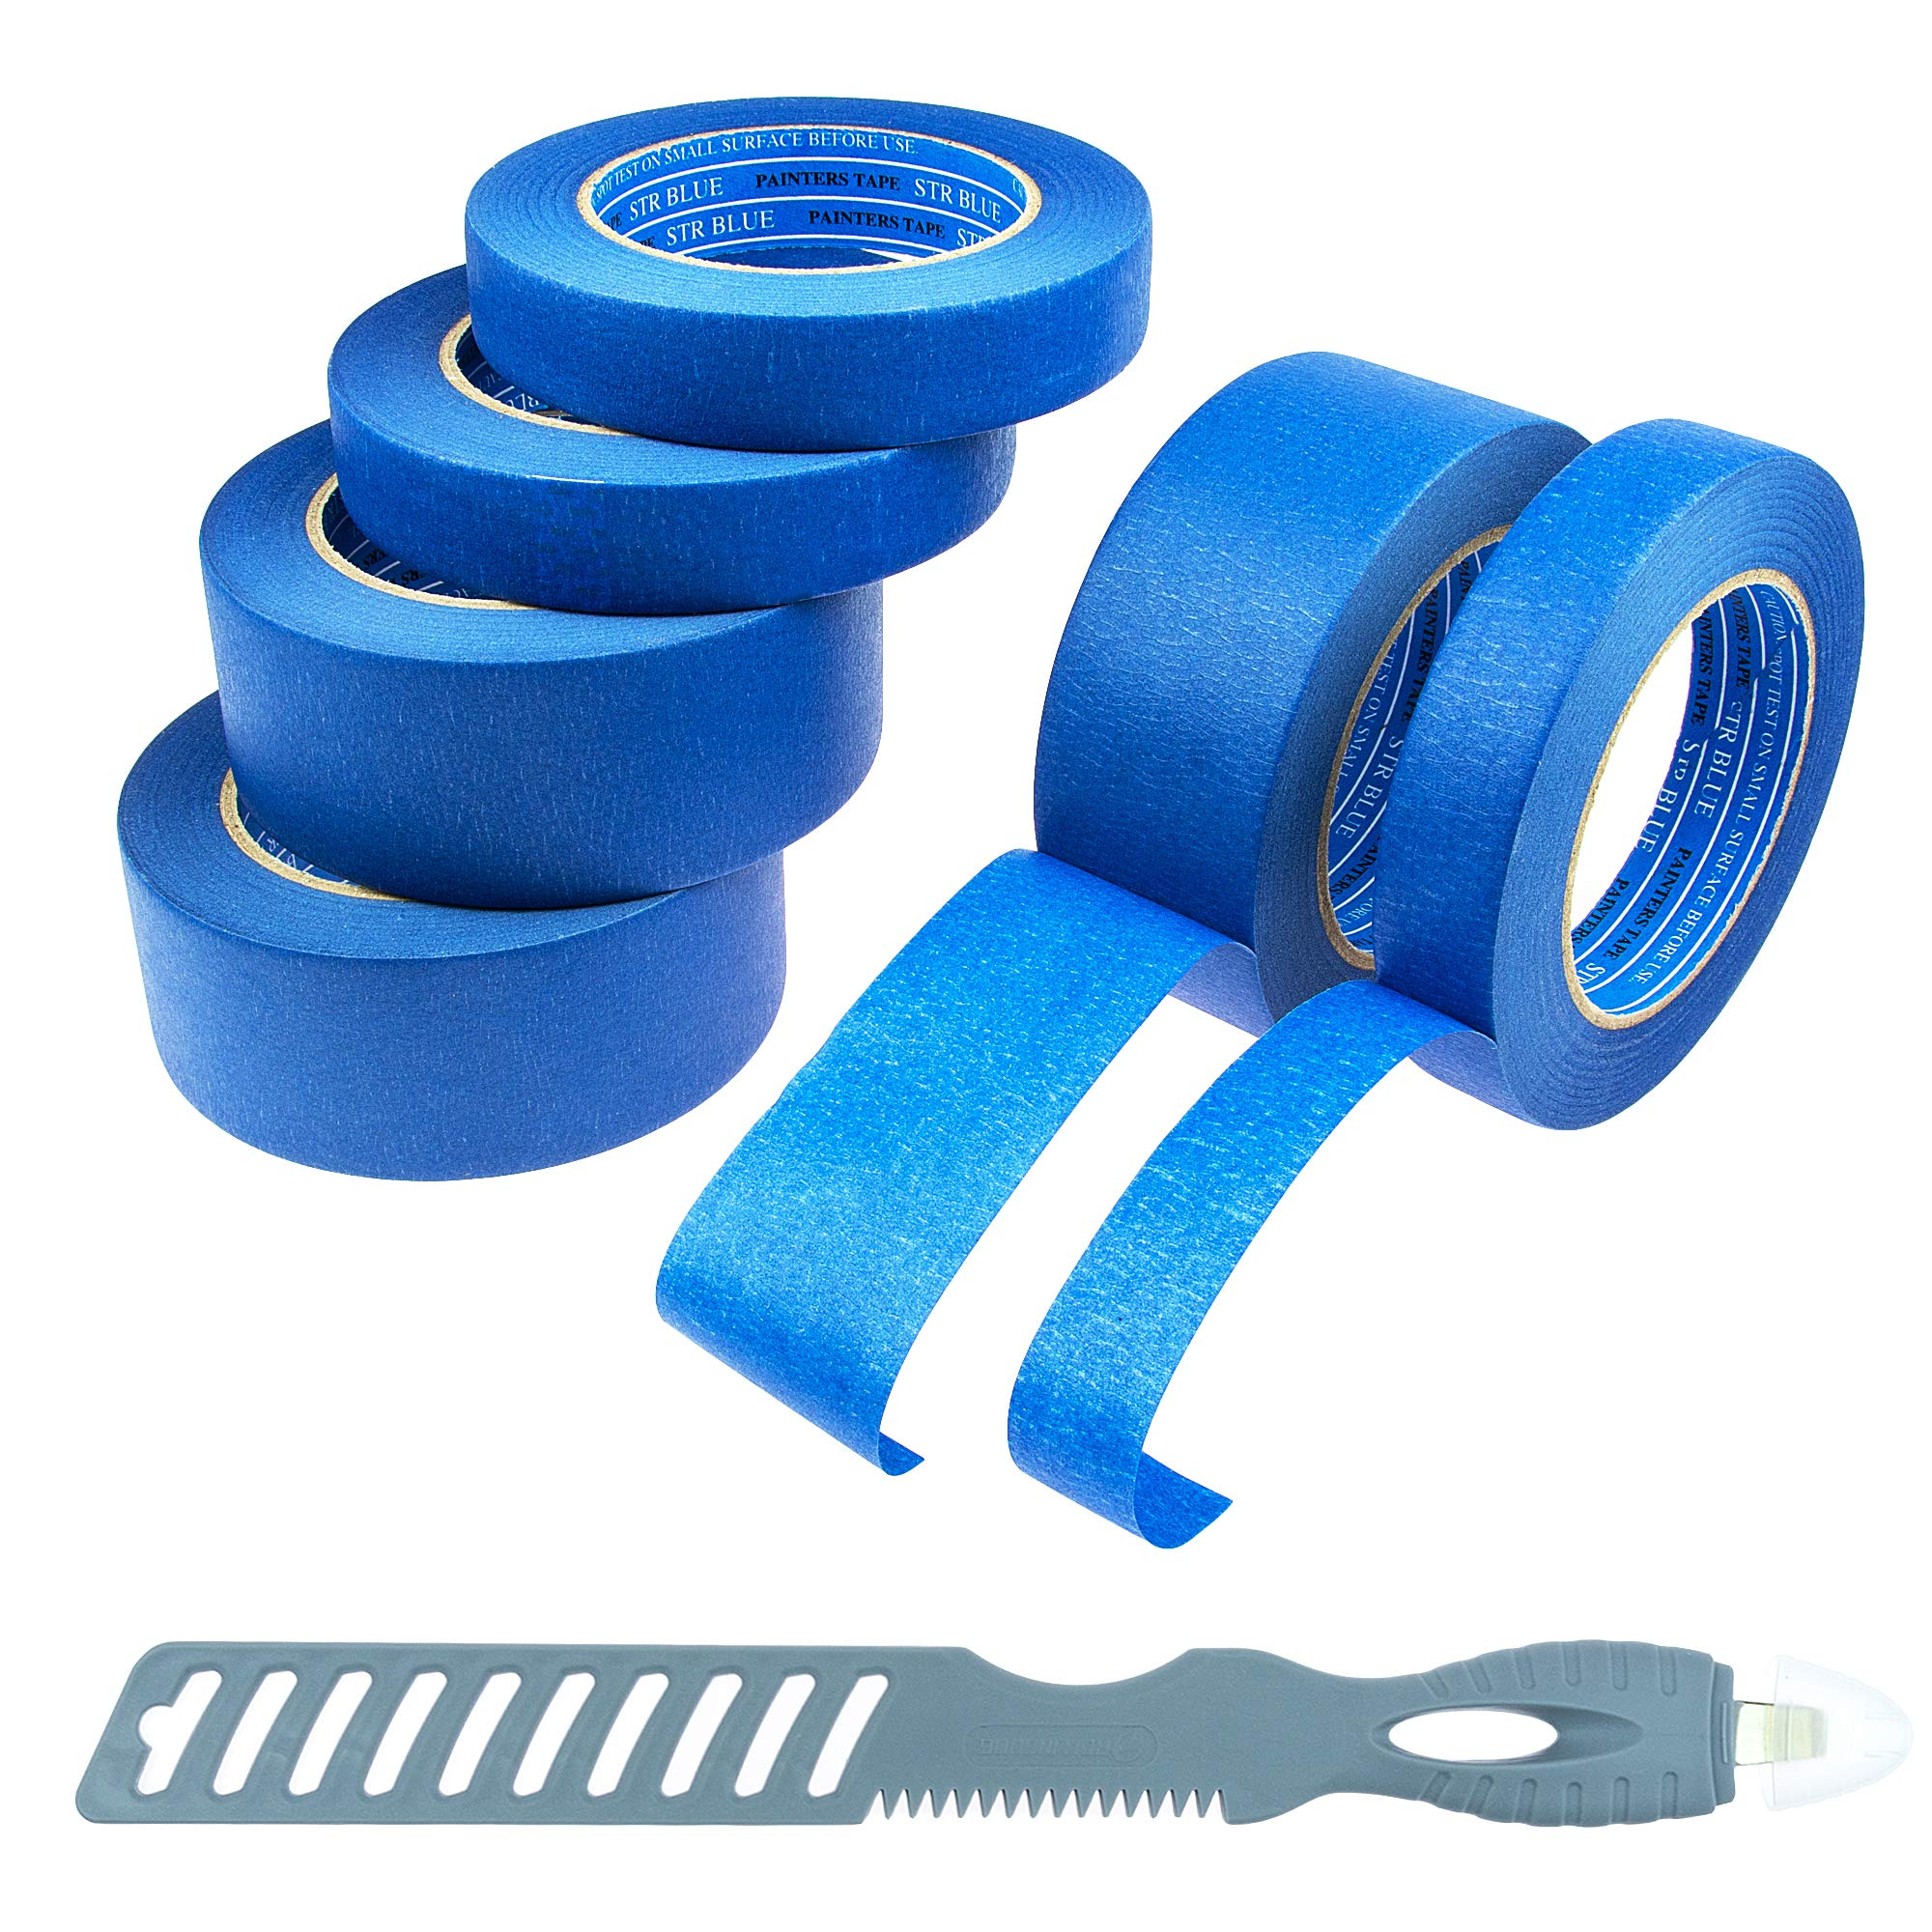 45e32979c92 Blue Painters Tape 6 Roll Kit (3 Rolls 1   2 Inch  Multitools)